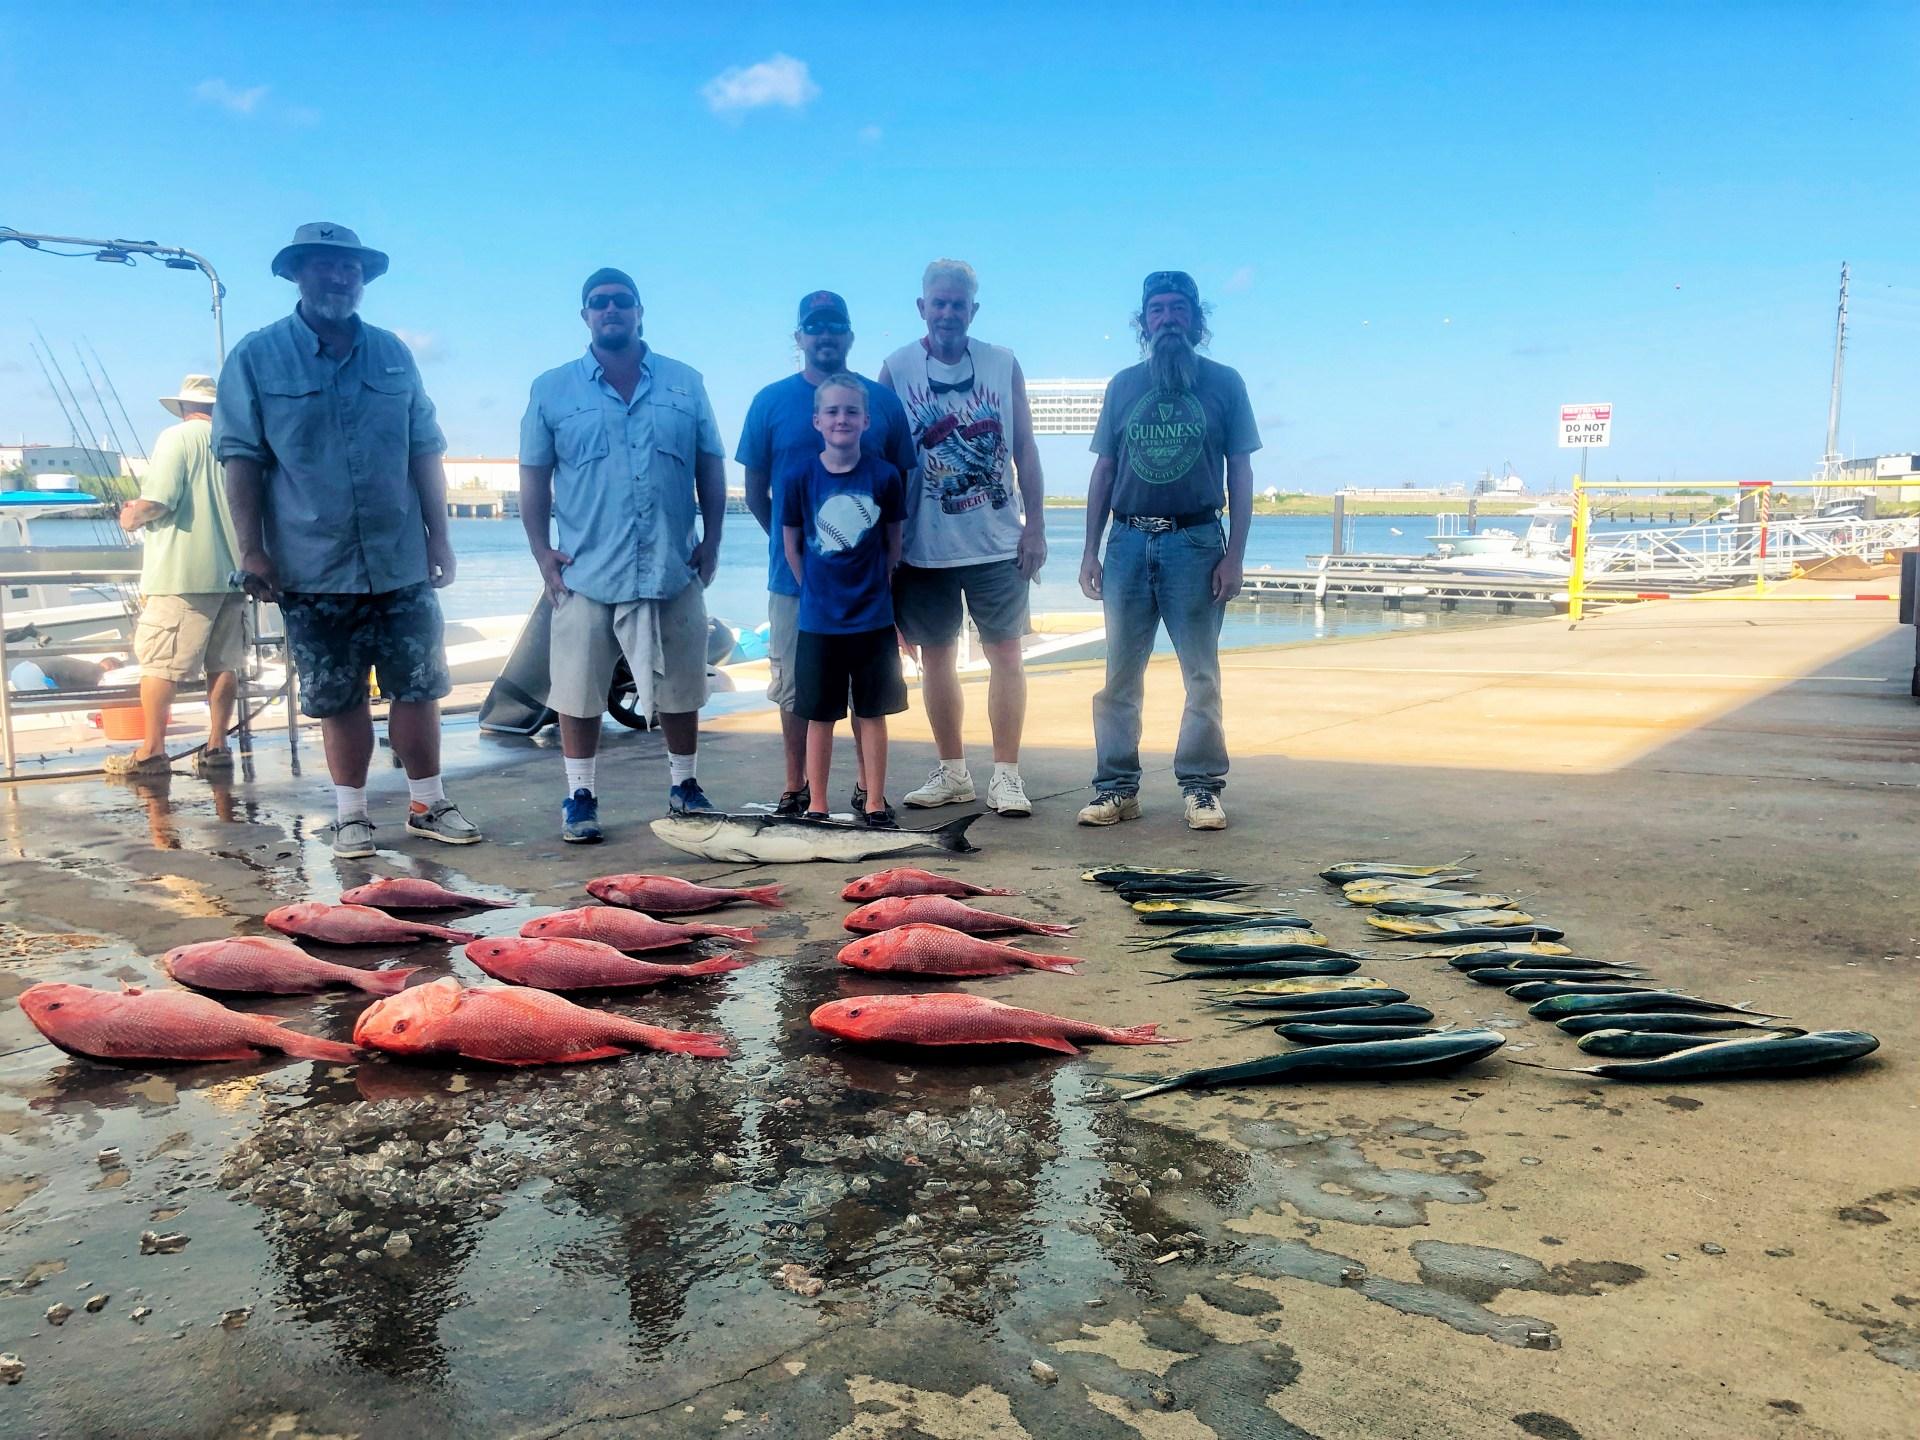 TAKE-A-KID-FISHING-2019